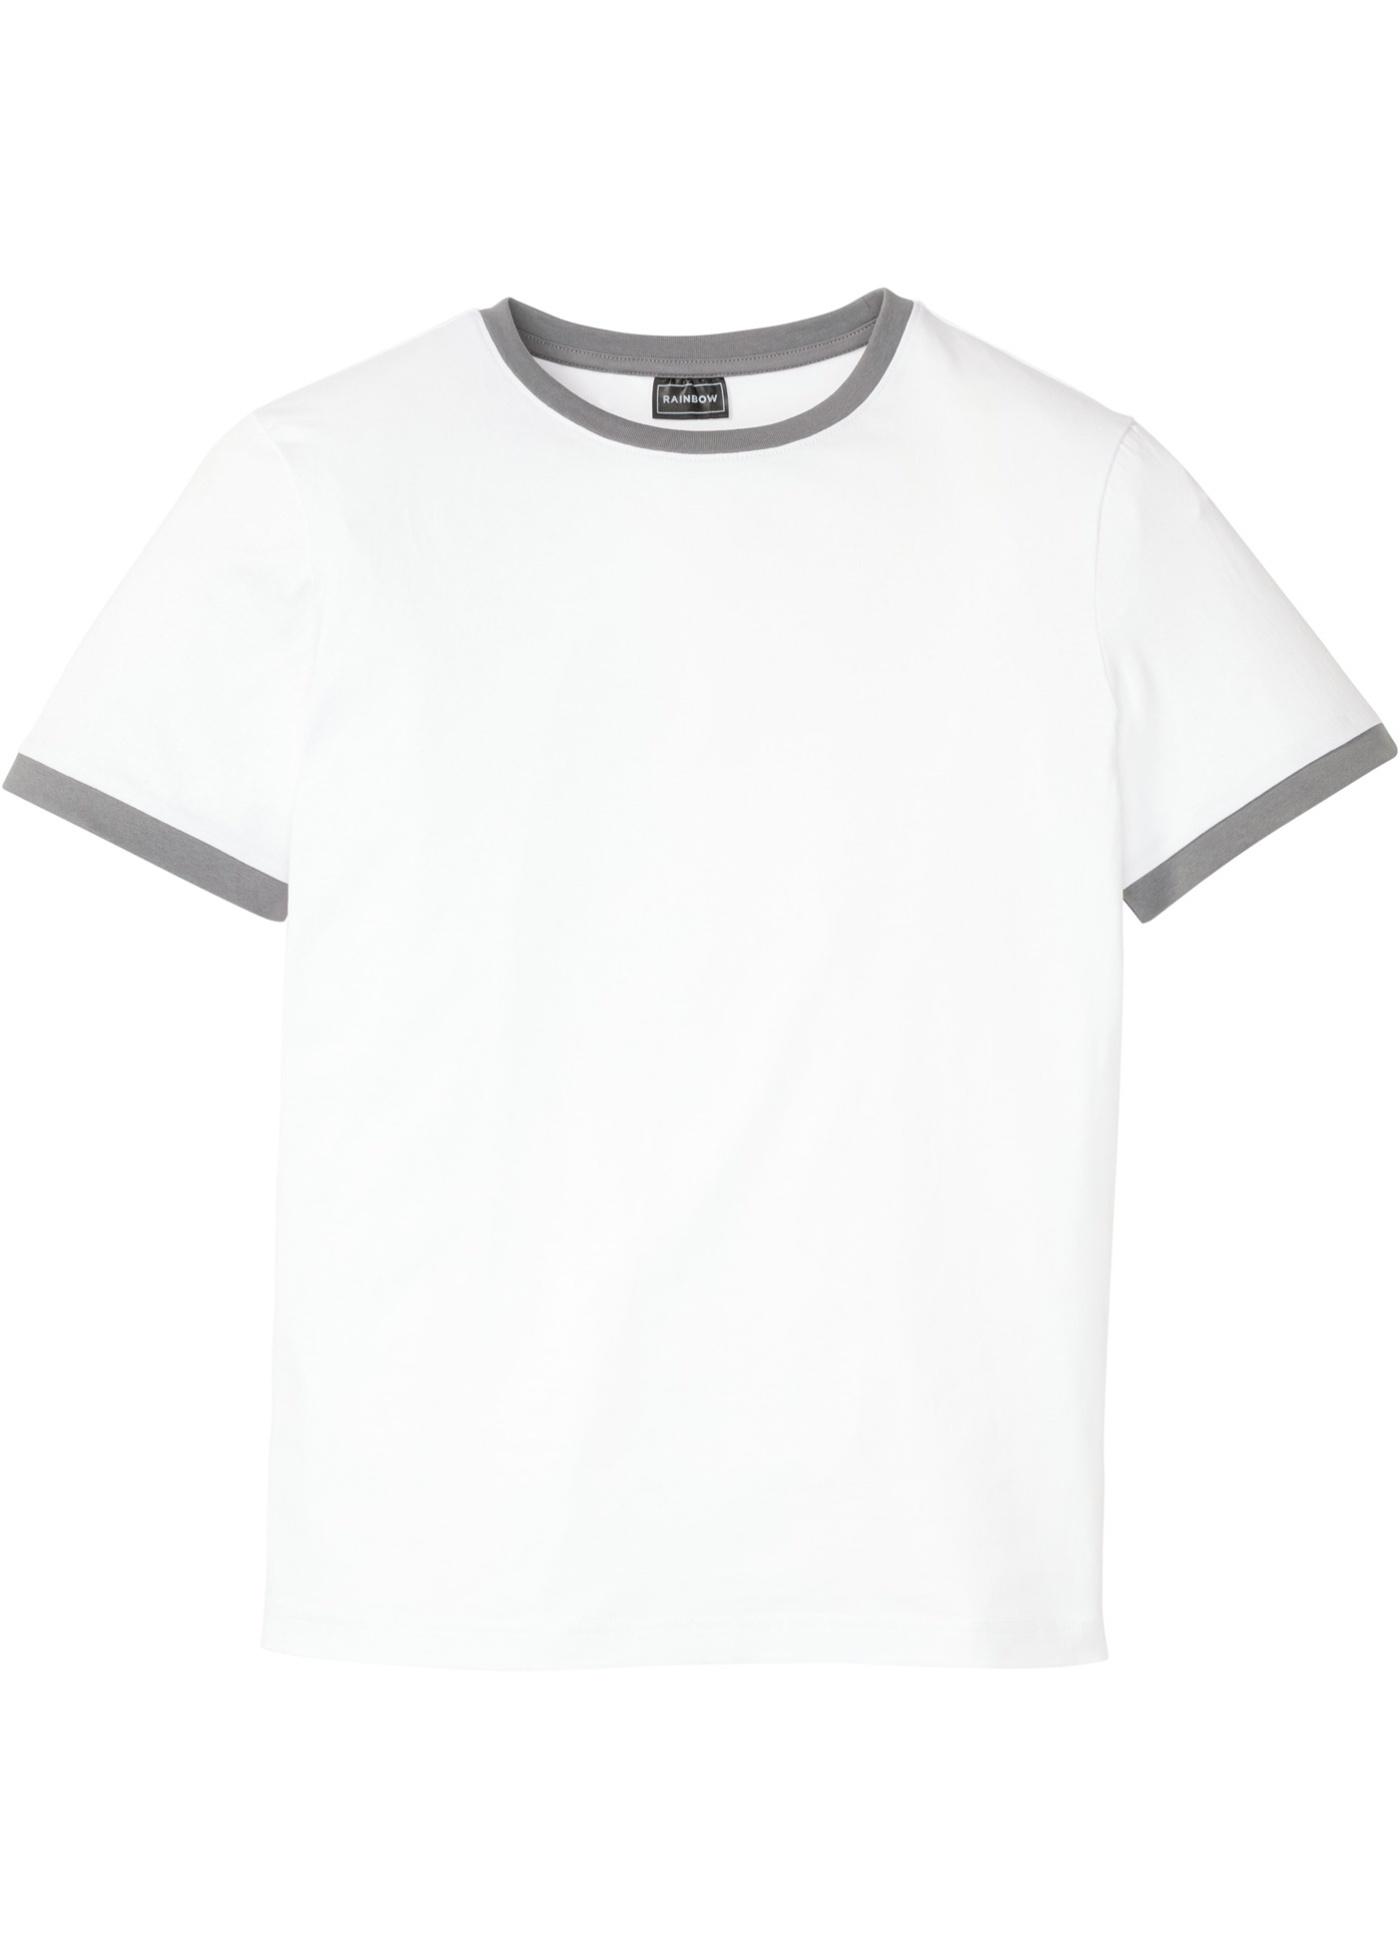 Stretchy T-shirt, Slim Fit